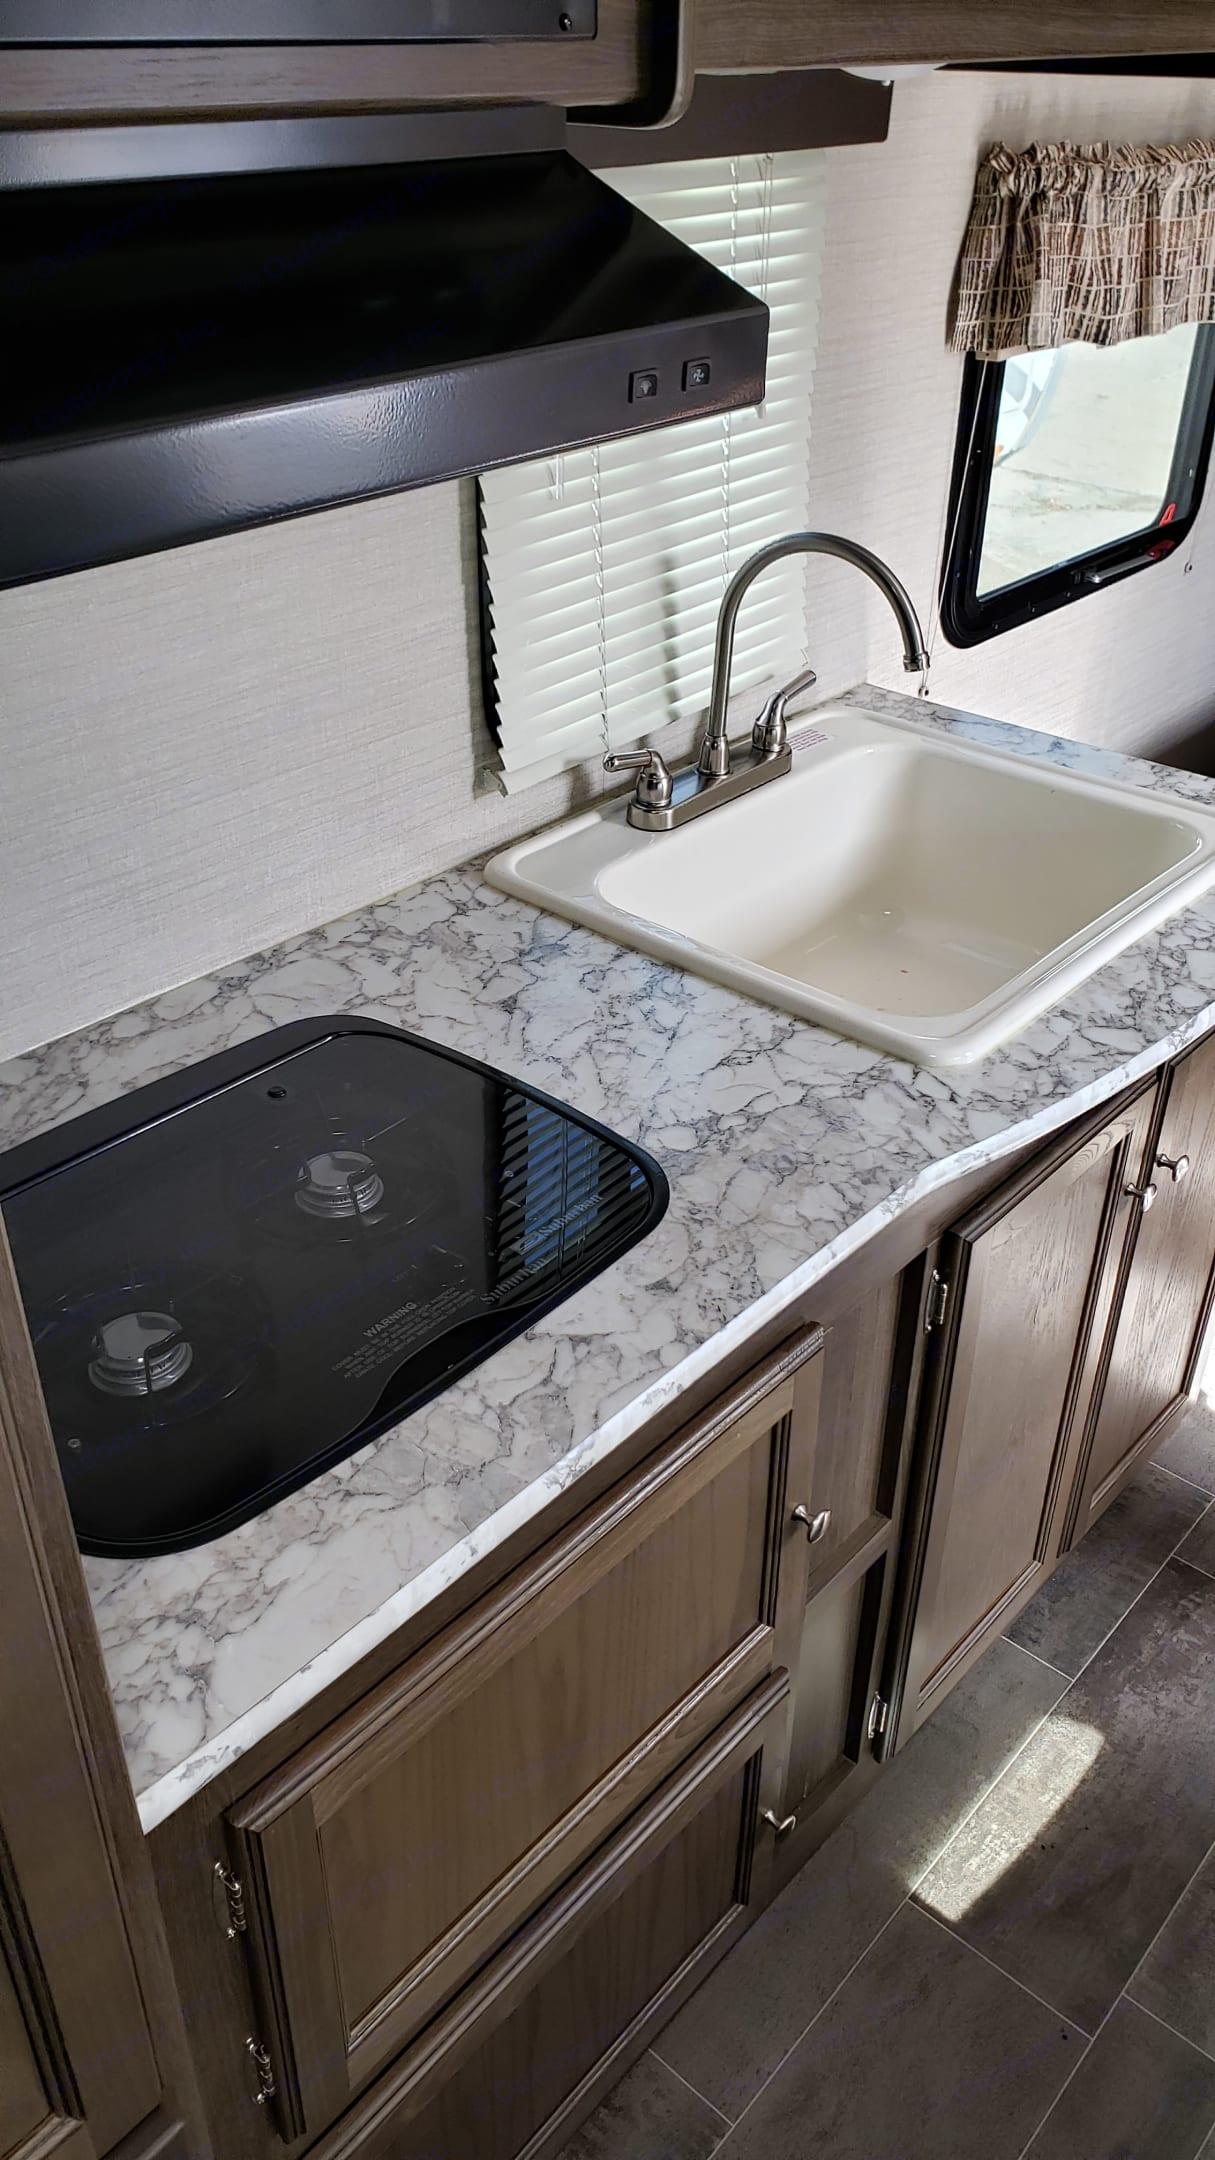 Deep sink for cleaning. Keystone Bullet 2018